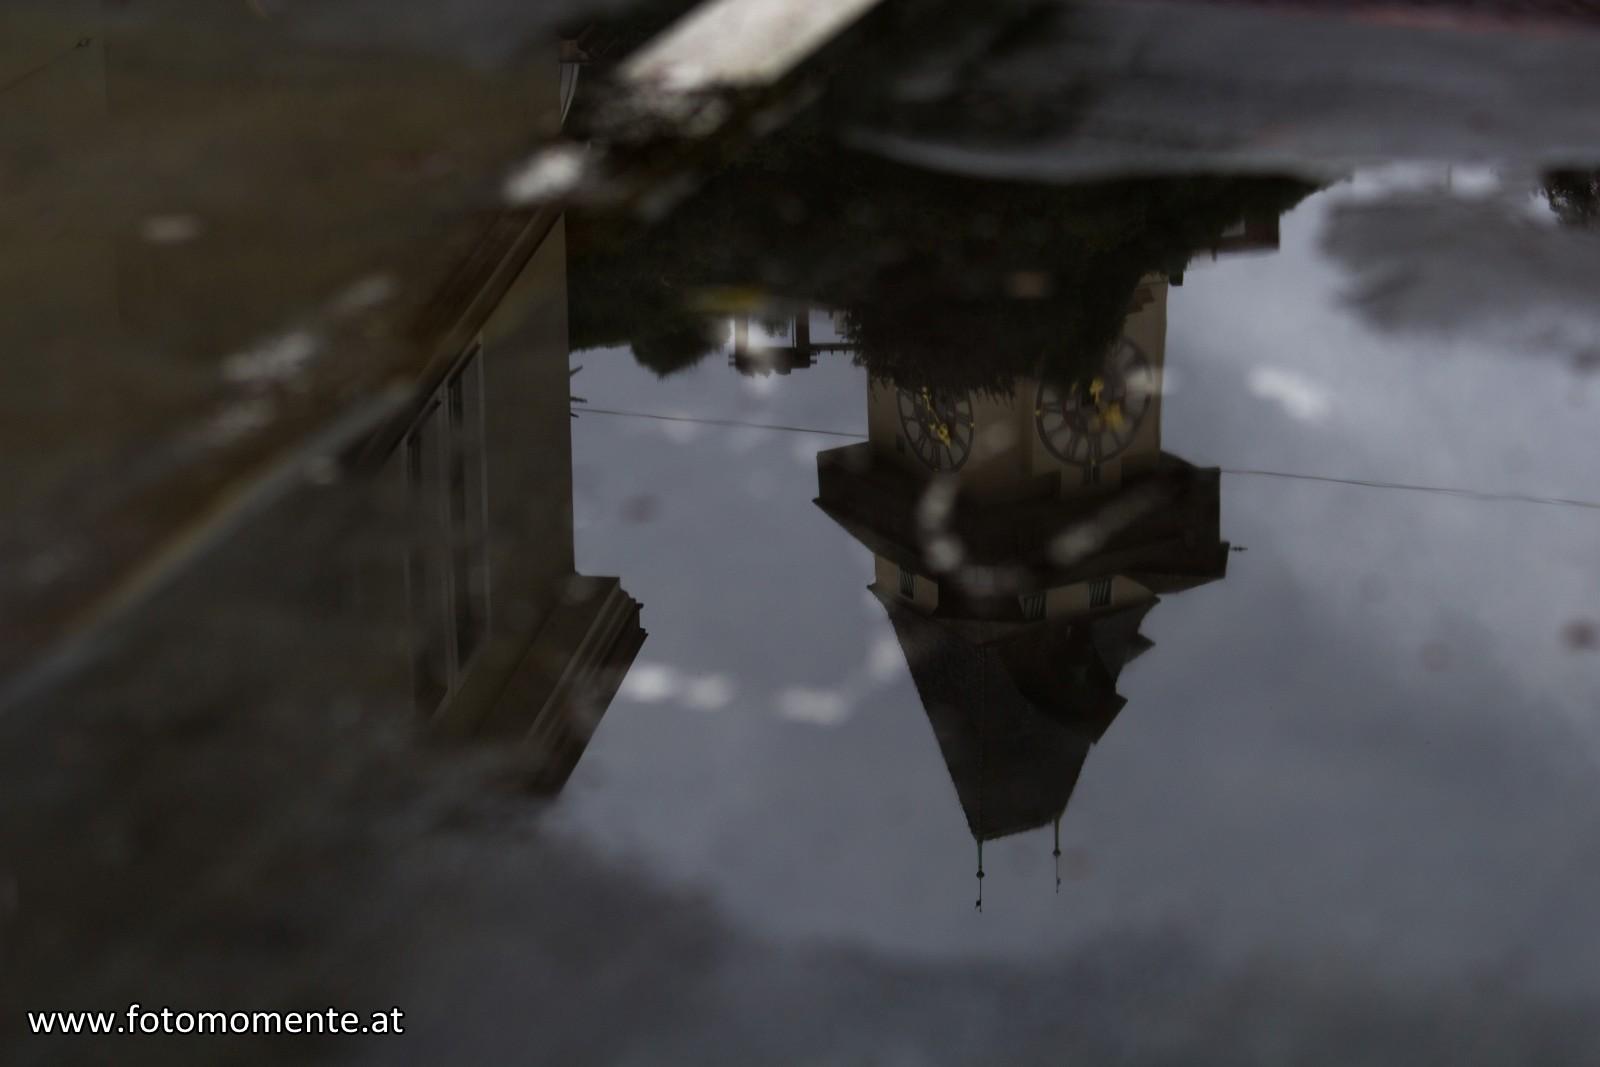 Uhrturmspiegelung in Regenpfütze